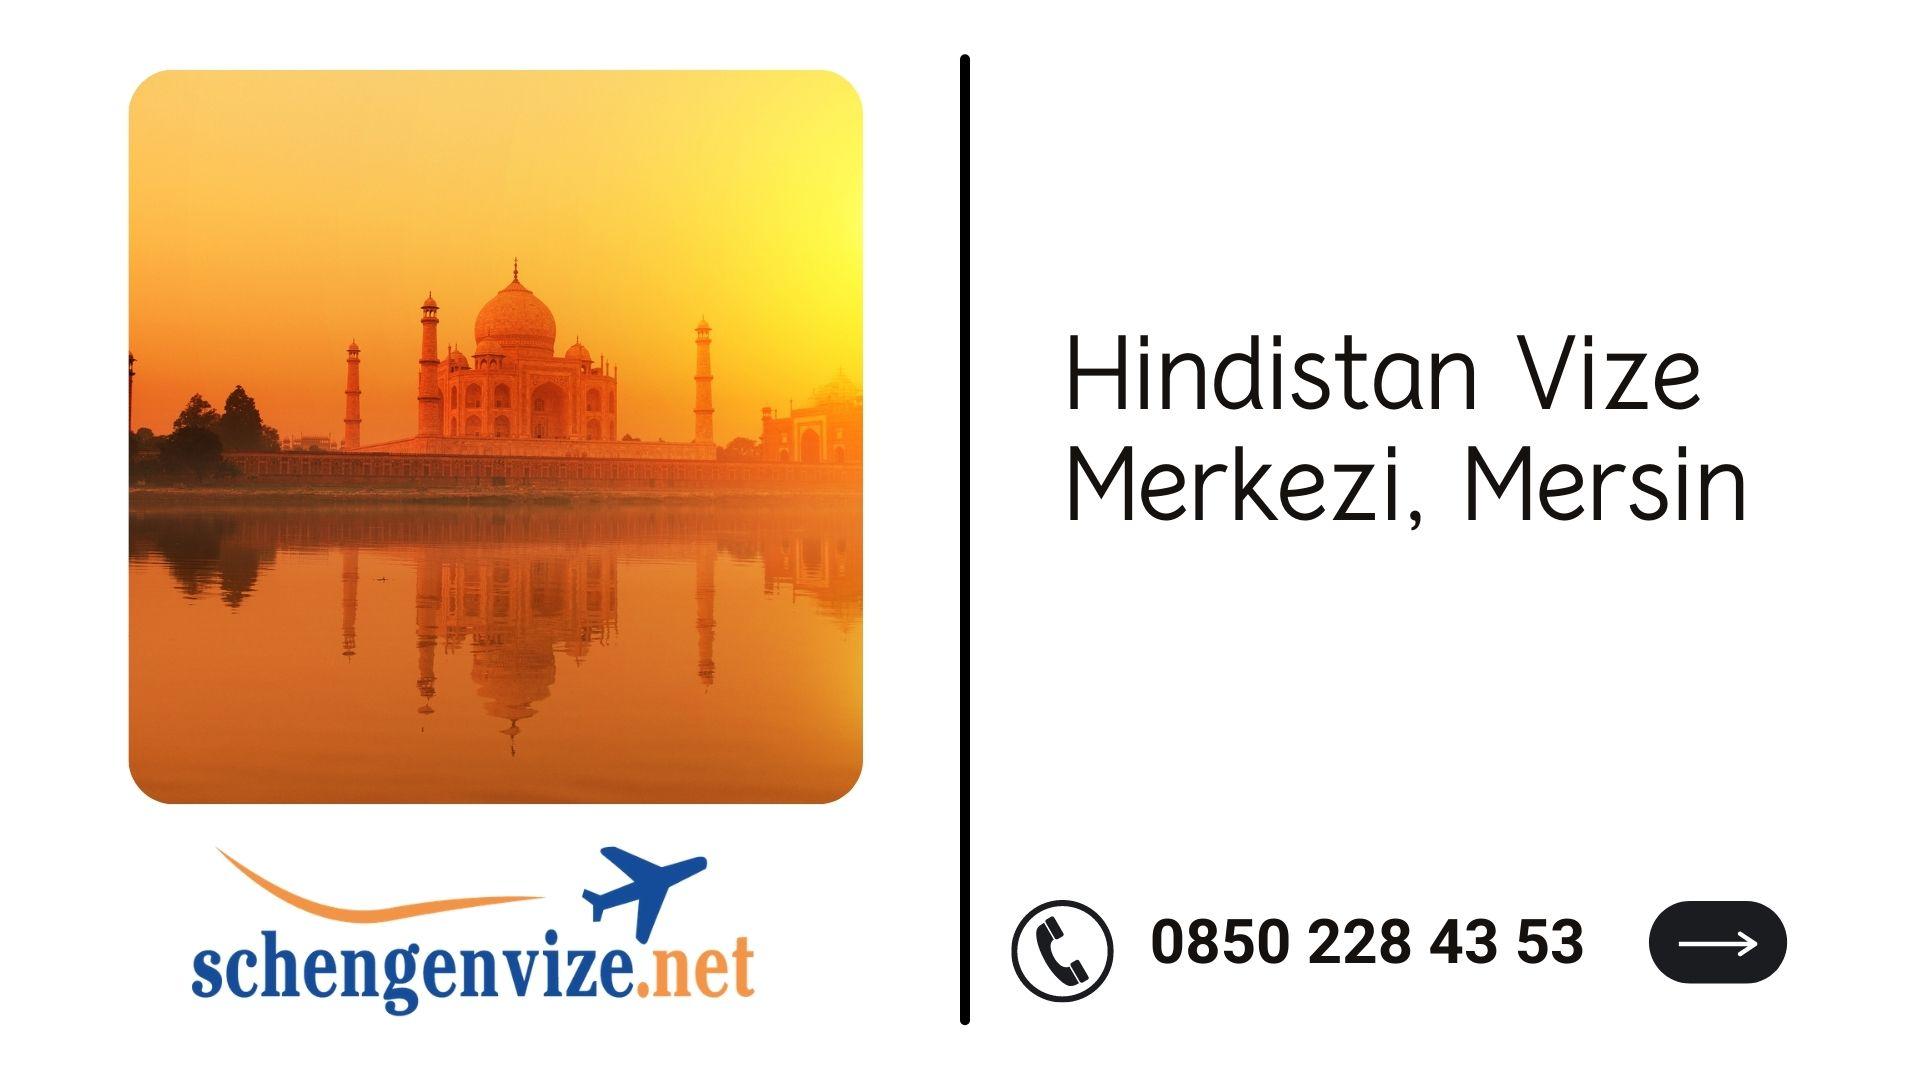 Hindistan Vize Merkezi, Mersin